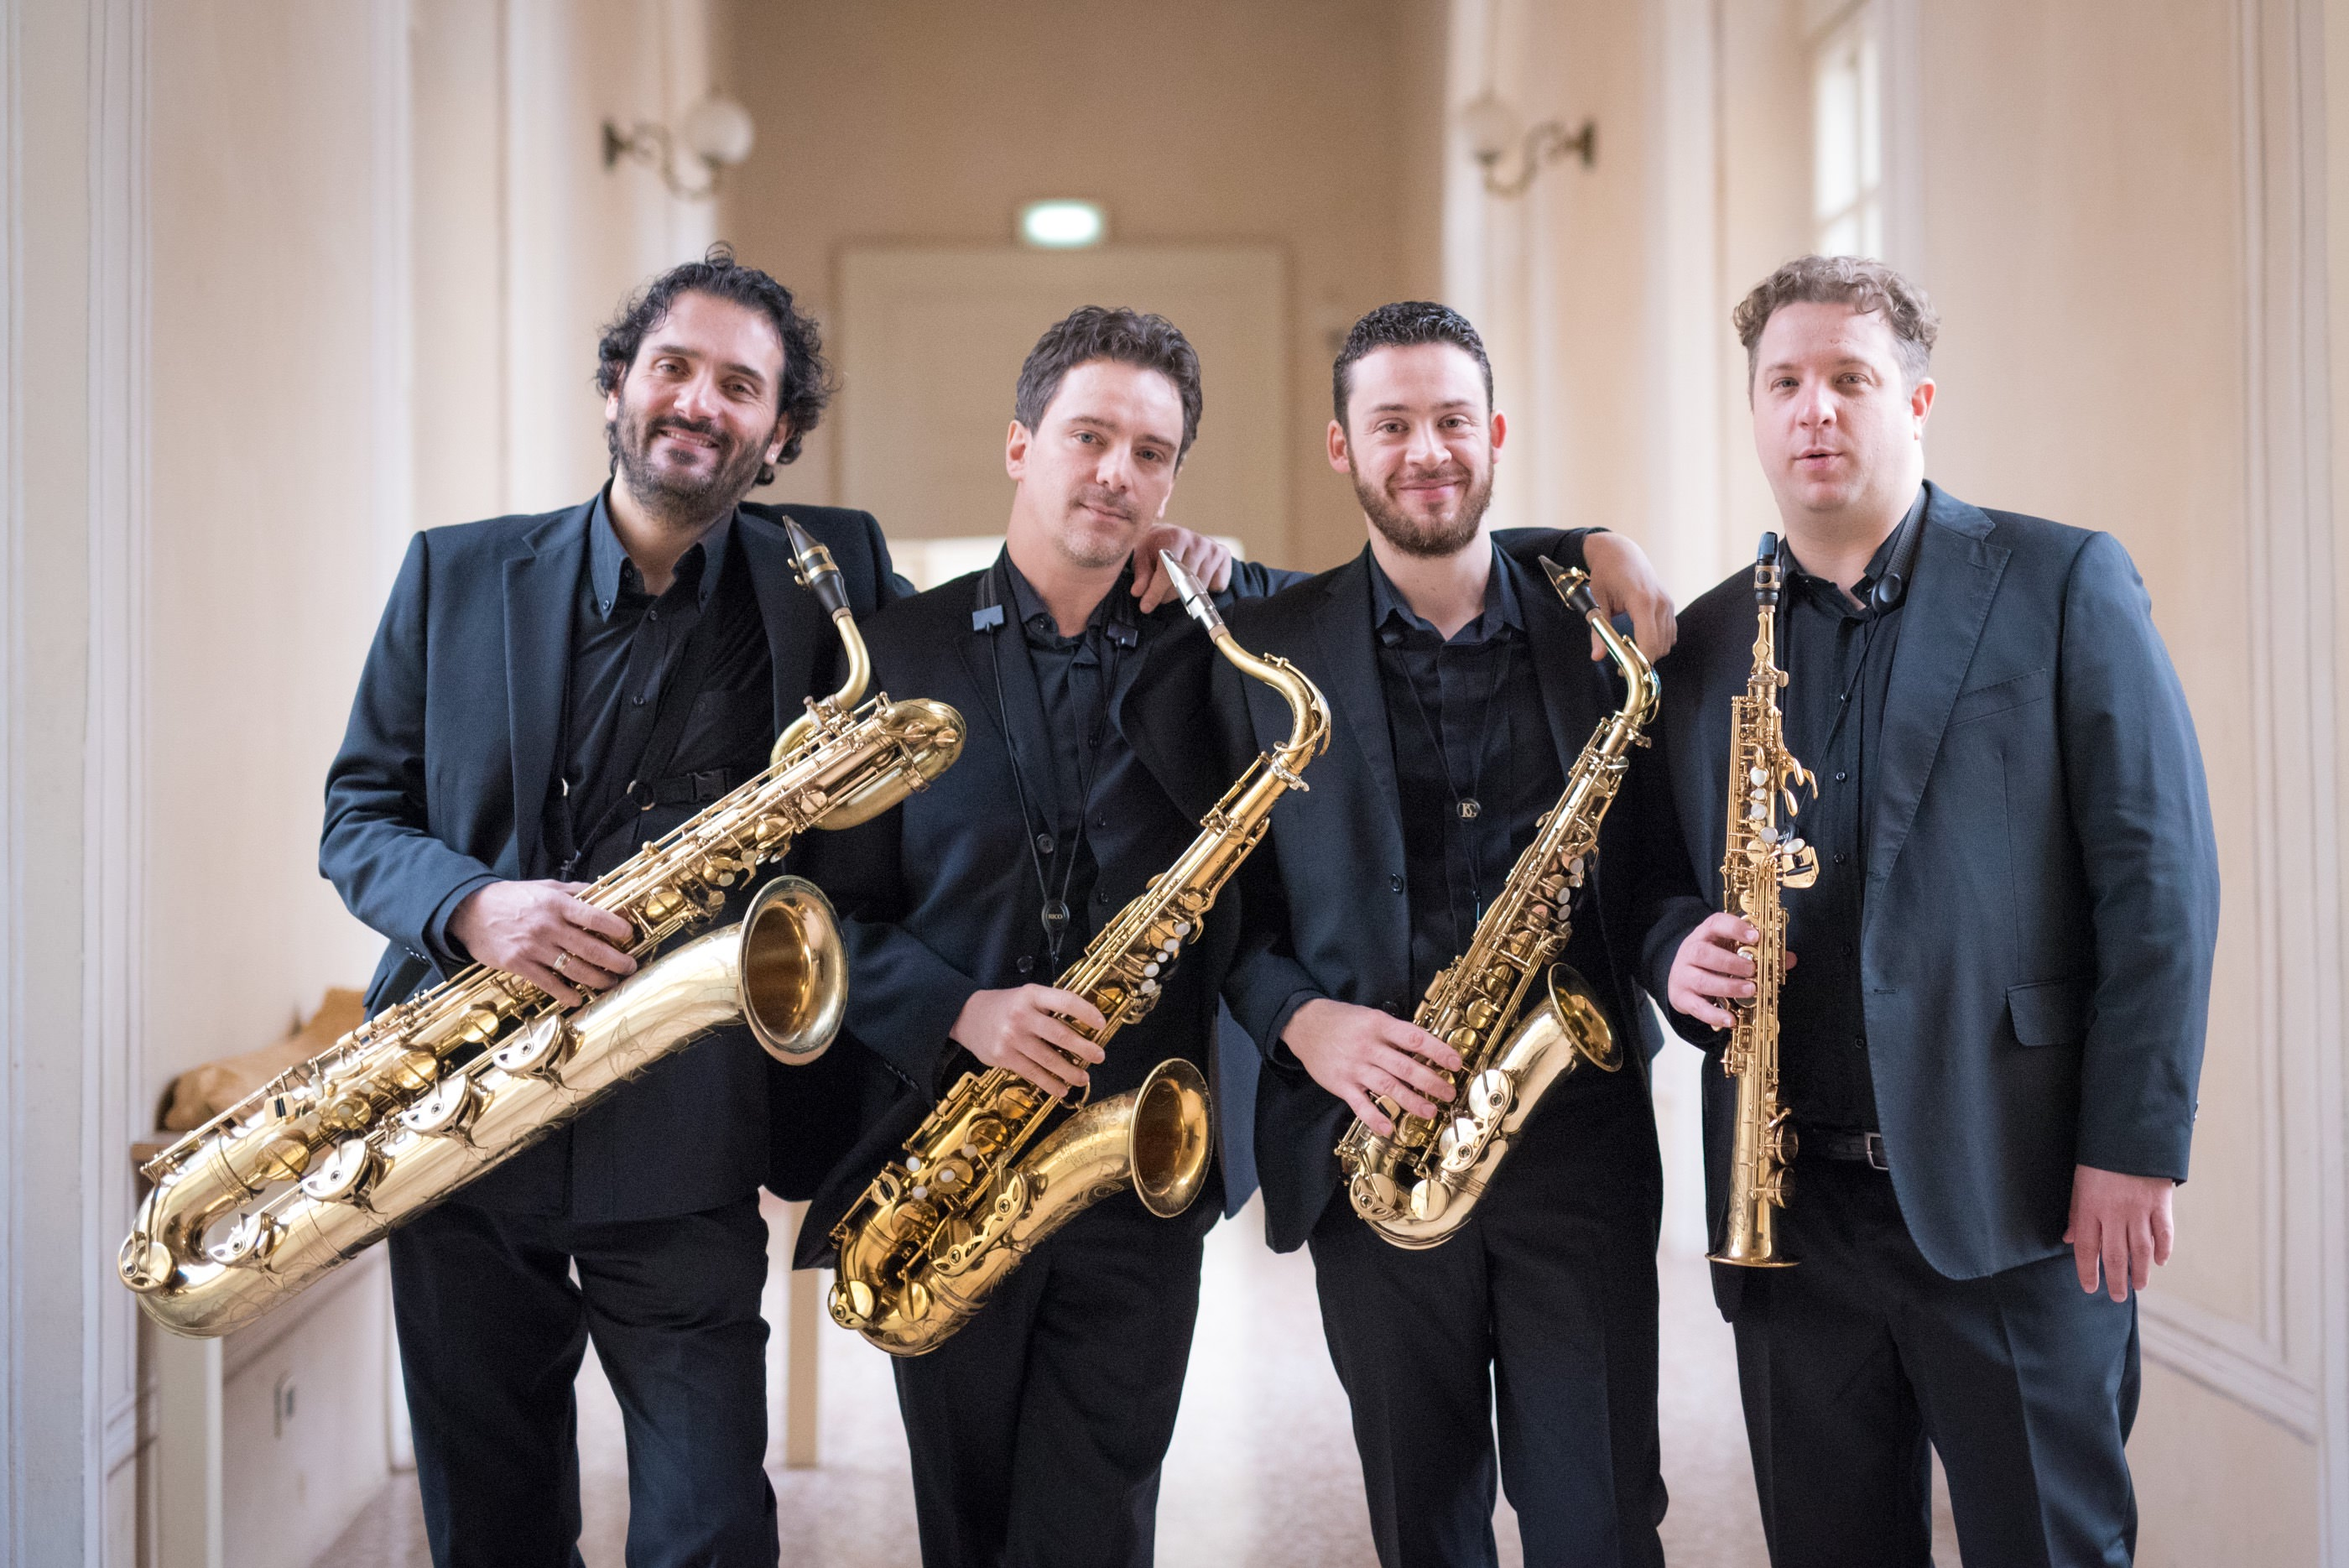 Quartetto Saxofoni Saxofollia